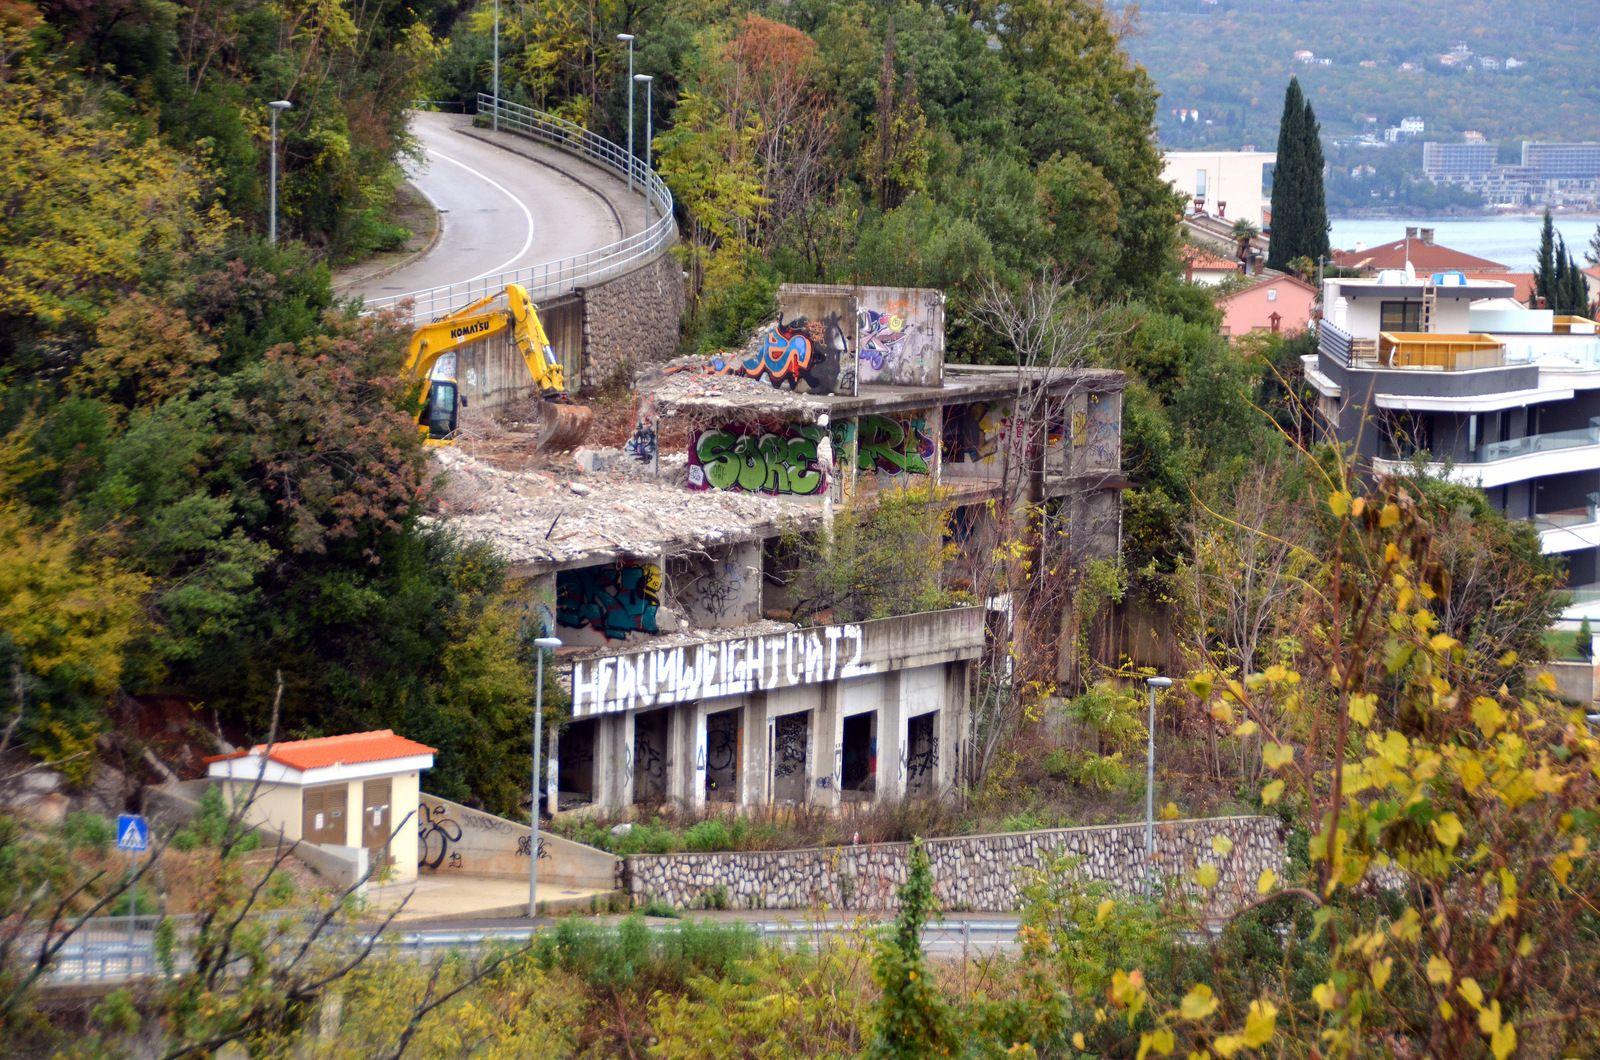 Ruši se tzv. nuklearka, nedovršena zgrada iza koje je stajao Gordan Širola, na Vrutkima, u Opatiji / Foto Nikola TURINA